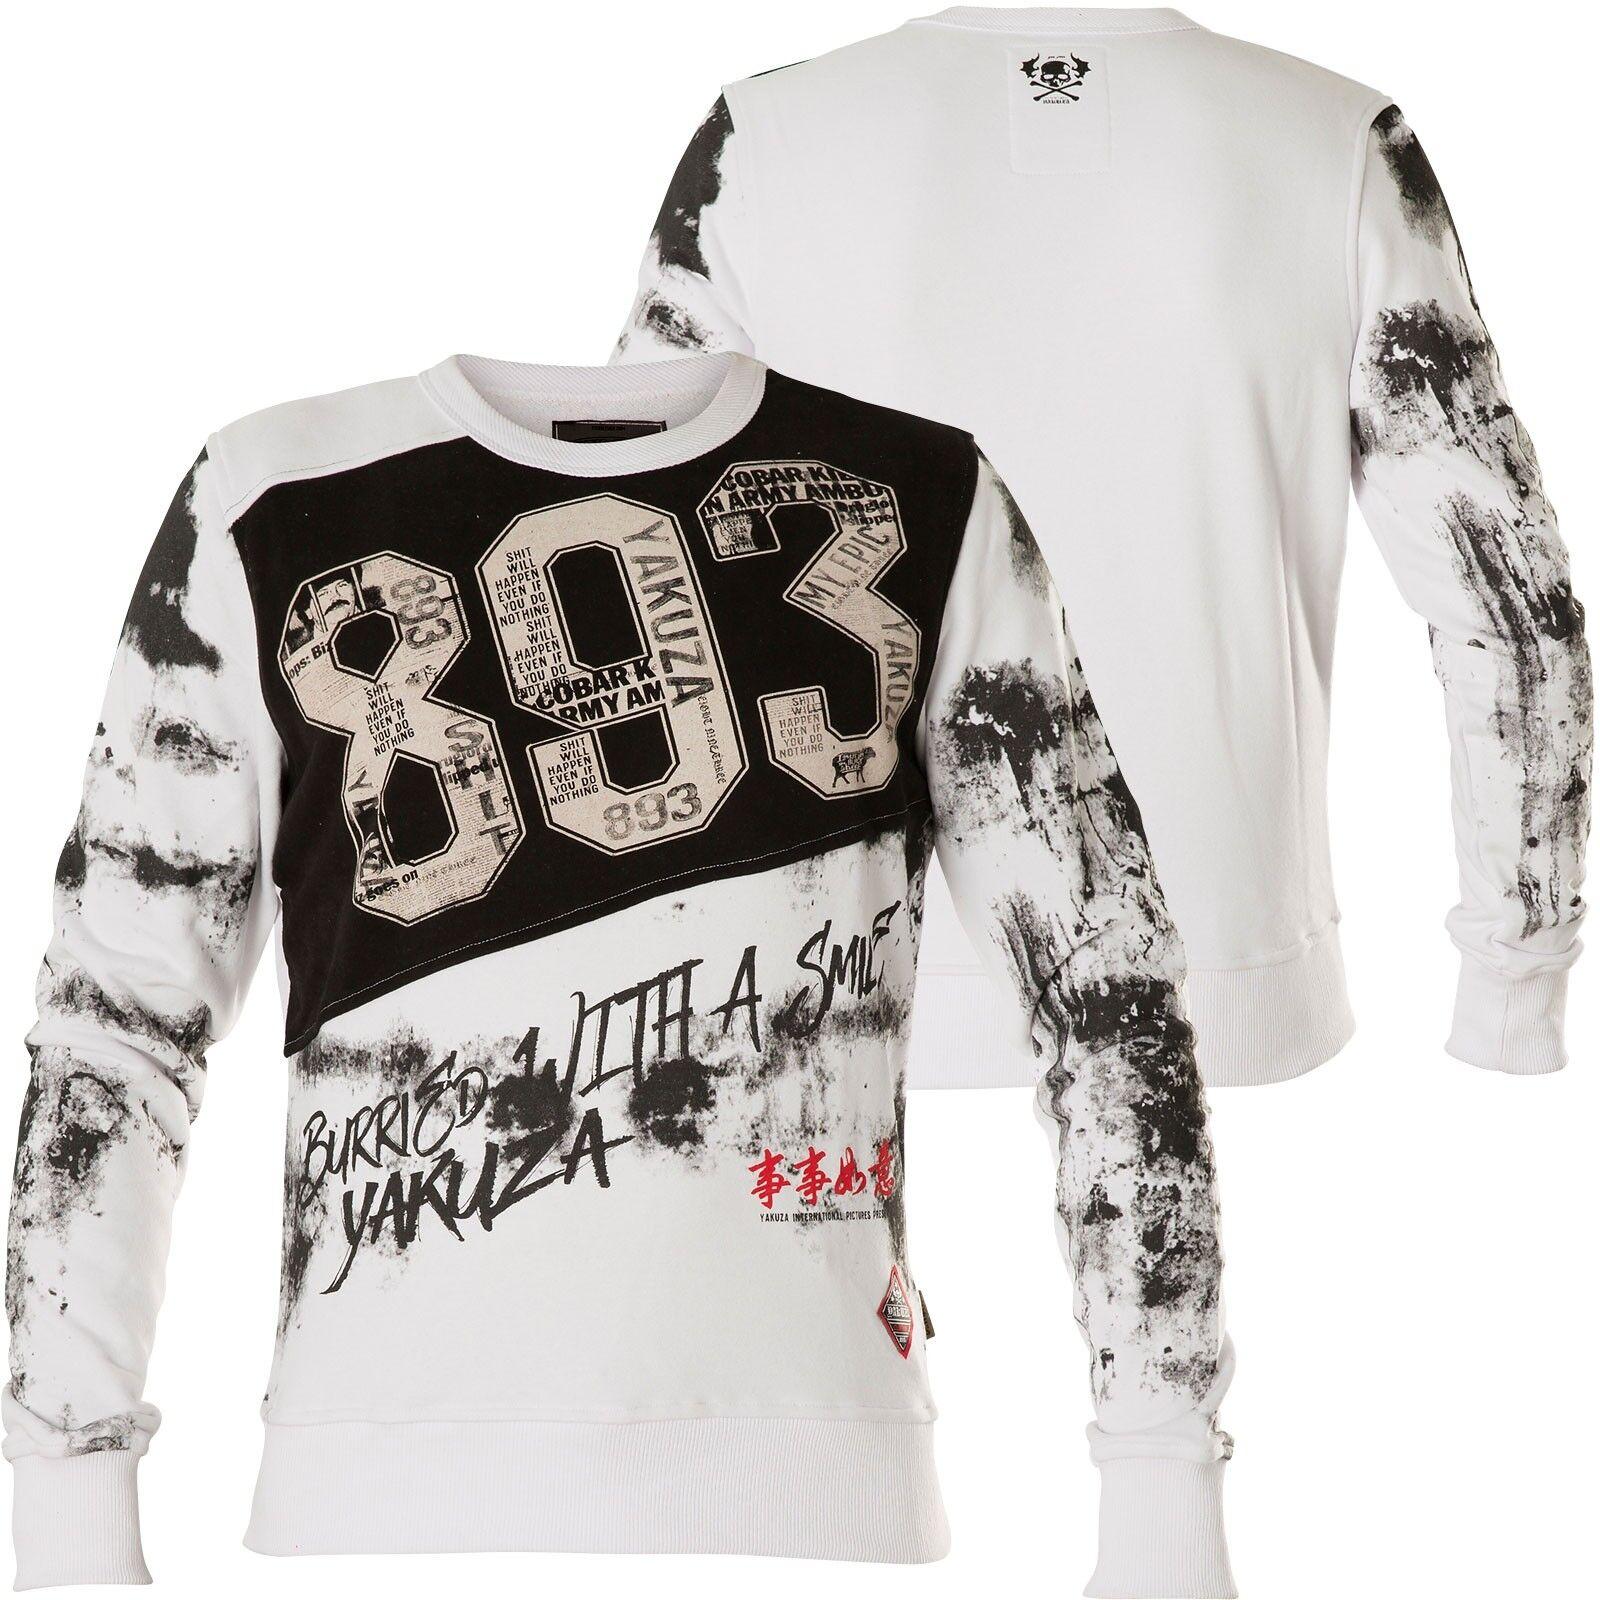 YAKUZA Sweatshirt Burried Jumper PB-13015 Weiß Weiß Sweatshirts